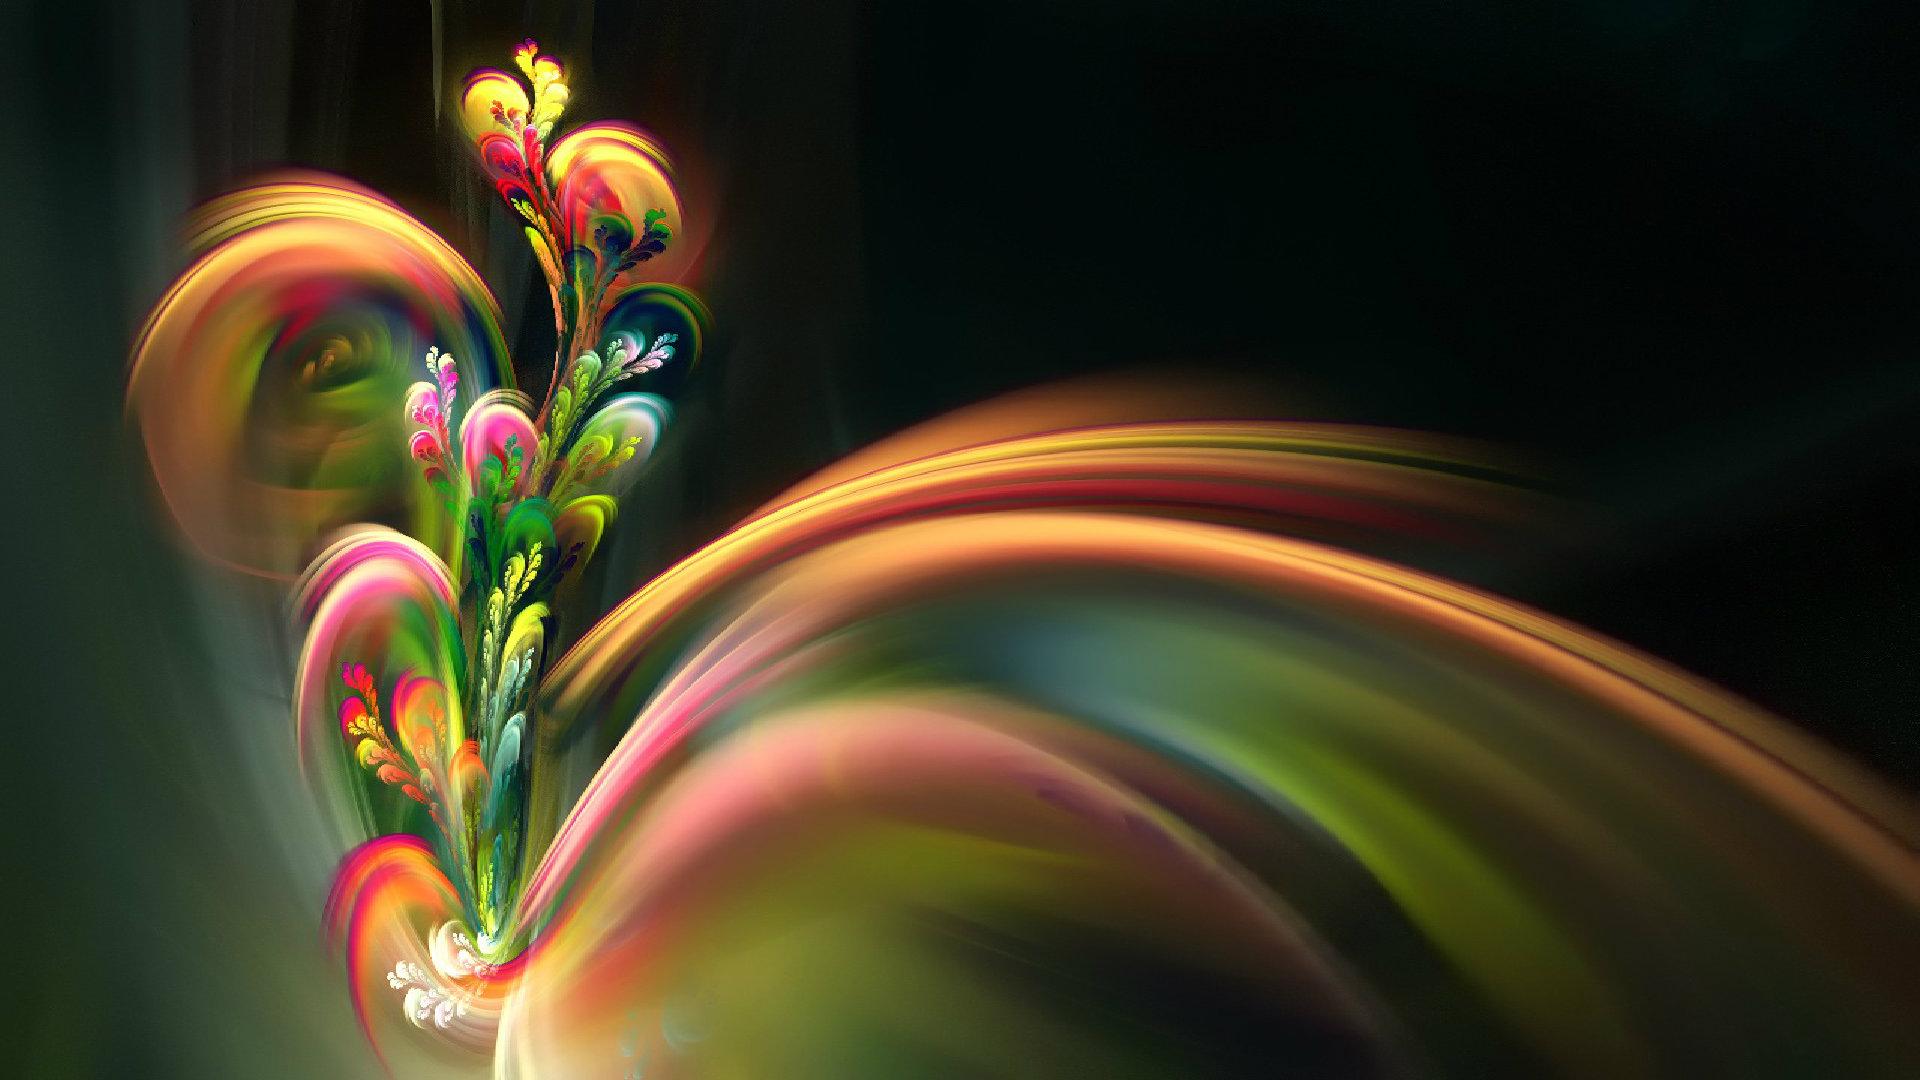 Free Beautiful Desktop Wallpaper Hd - Beautiful Background Images For Desktop Hd , HD Wallpaper & Backgrounds